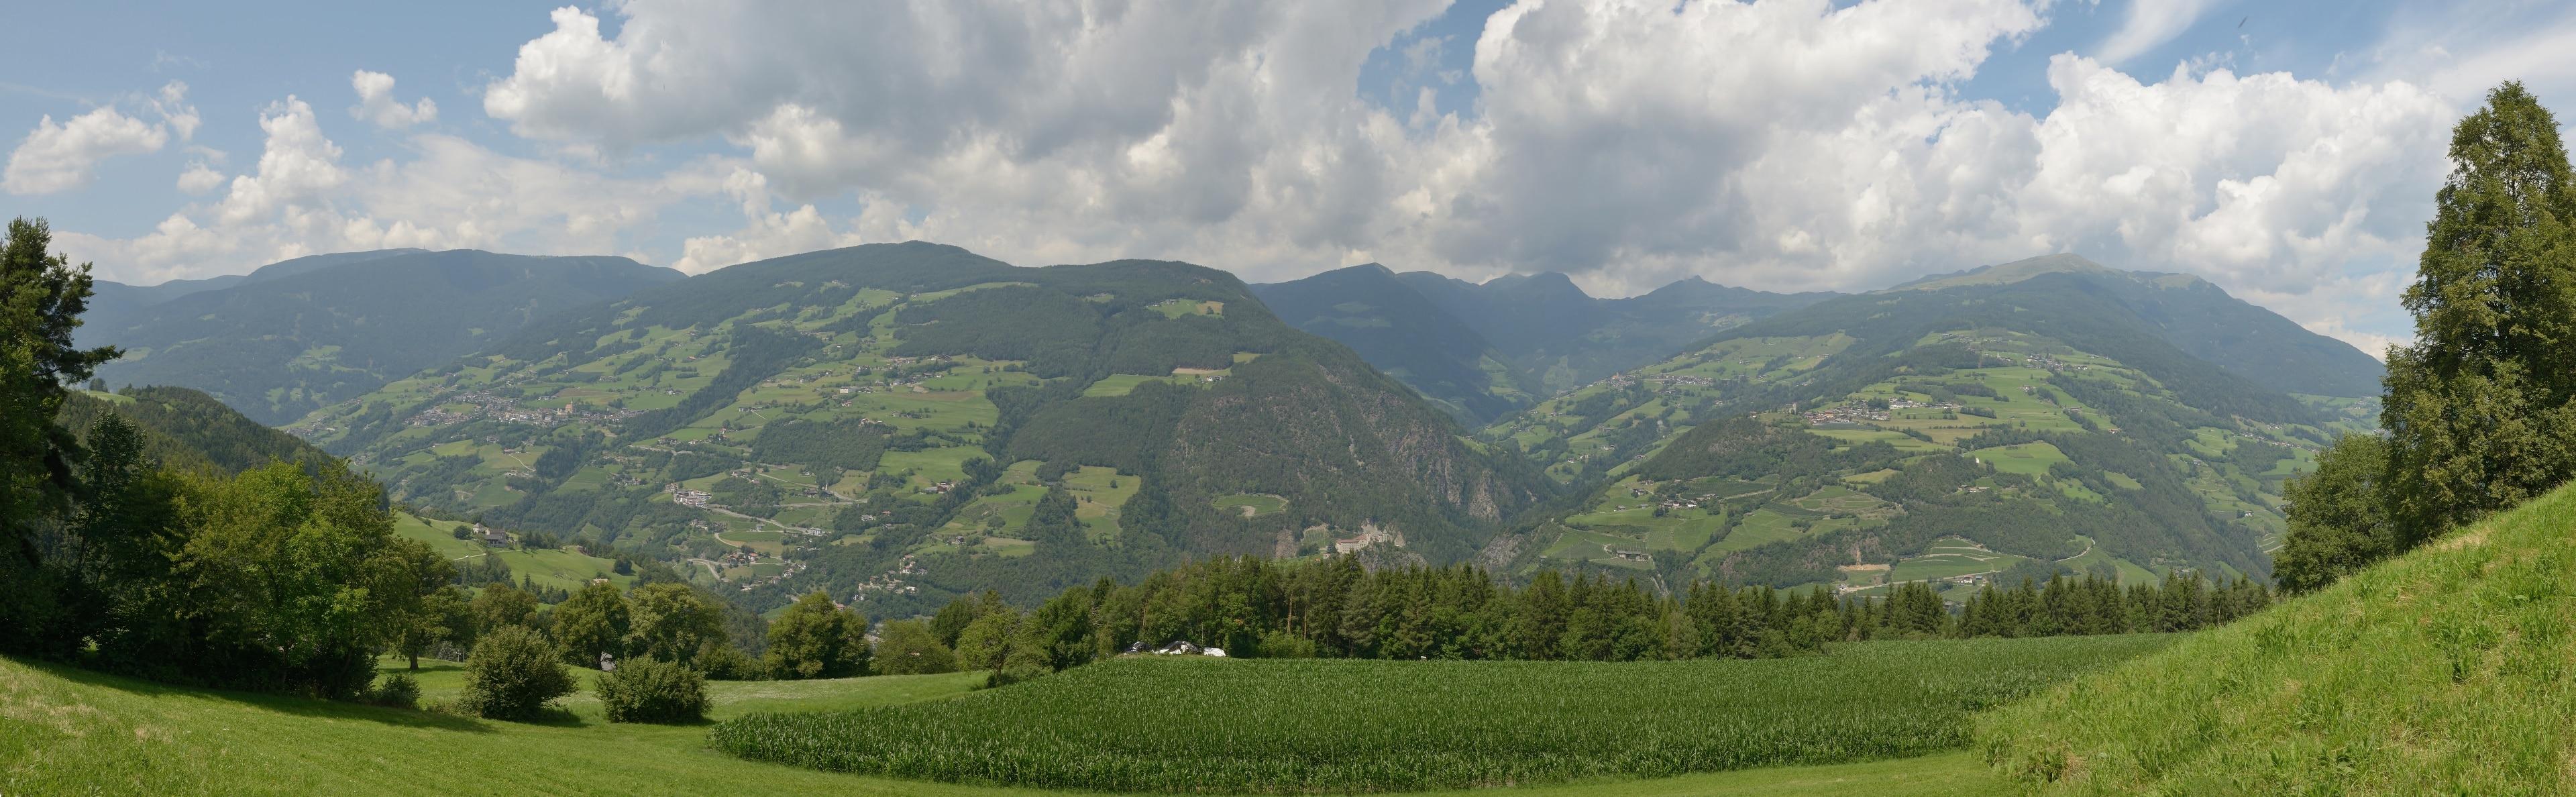 Laion, Trentino-Alto Adige, Italy